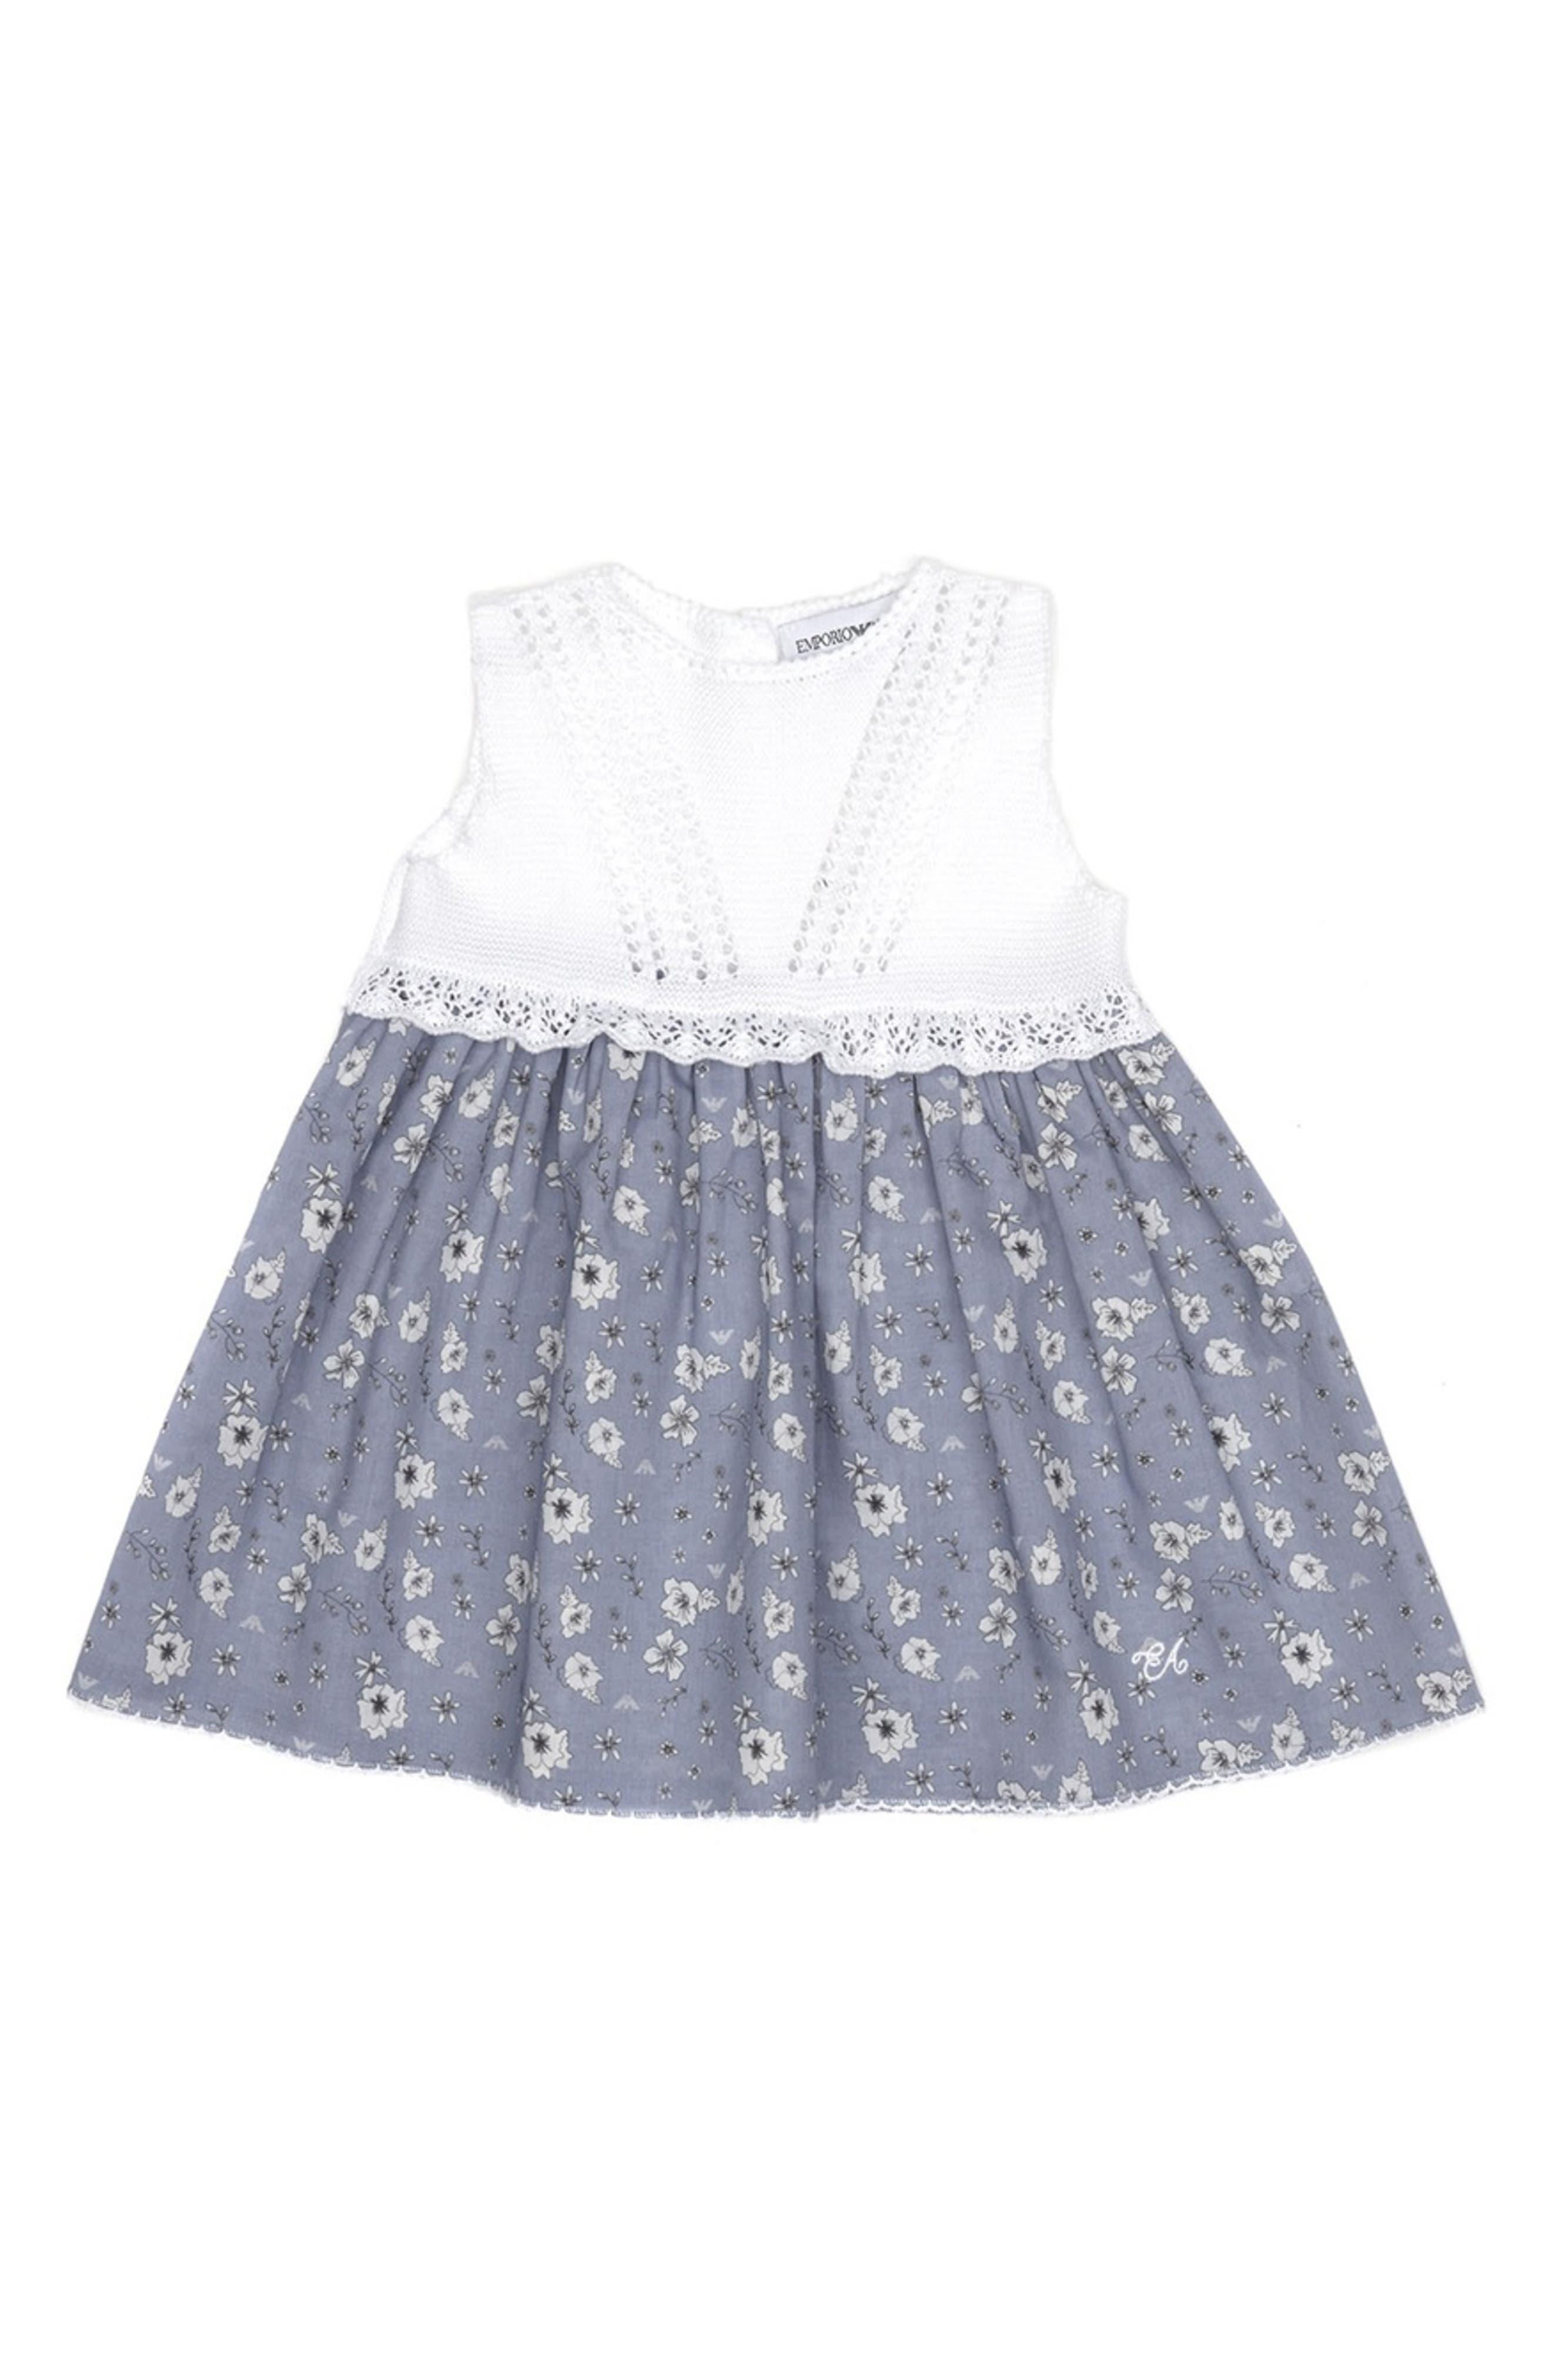 ARMANI JUNIOR Sleeveless Floral Print Dress, Main, color, FANT.TURCHESE